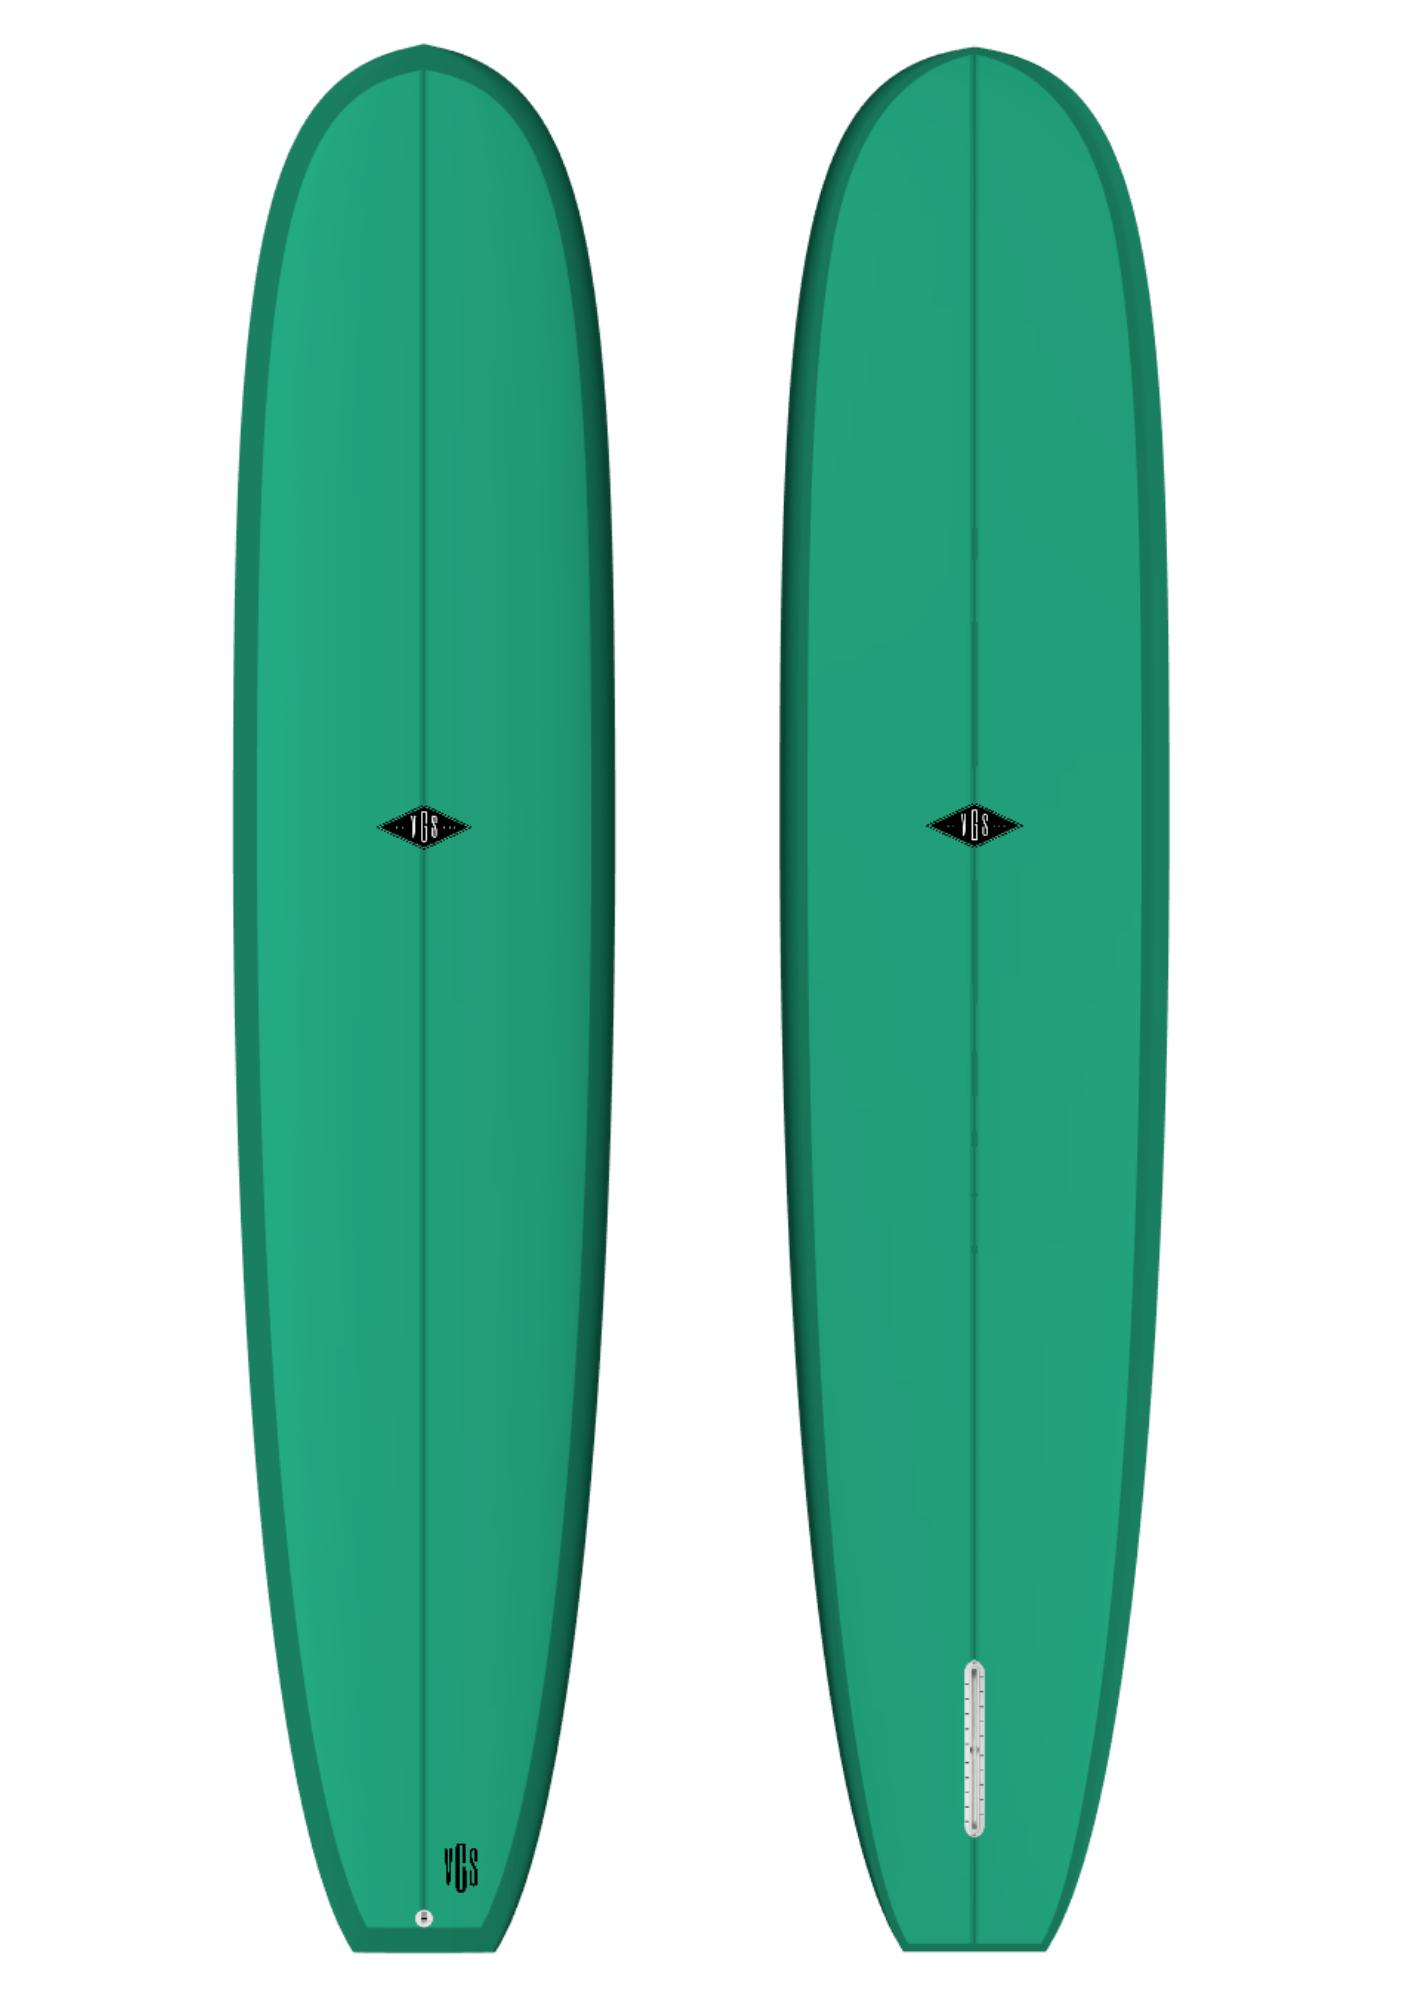 Longboard Log Egg | Vgs Custom Boards